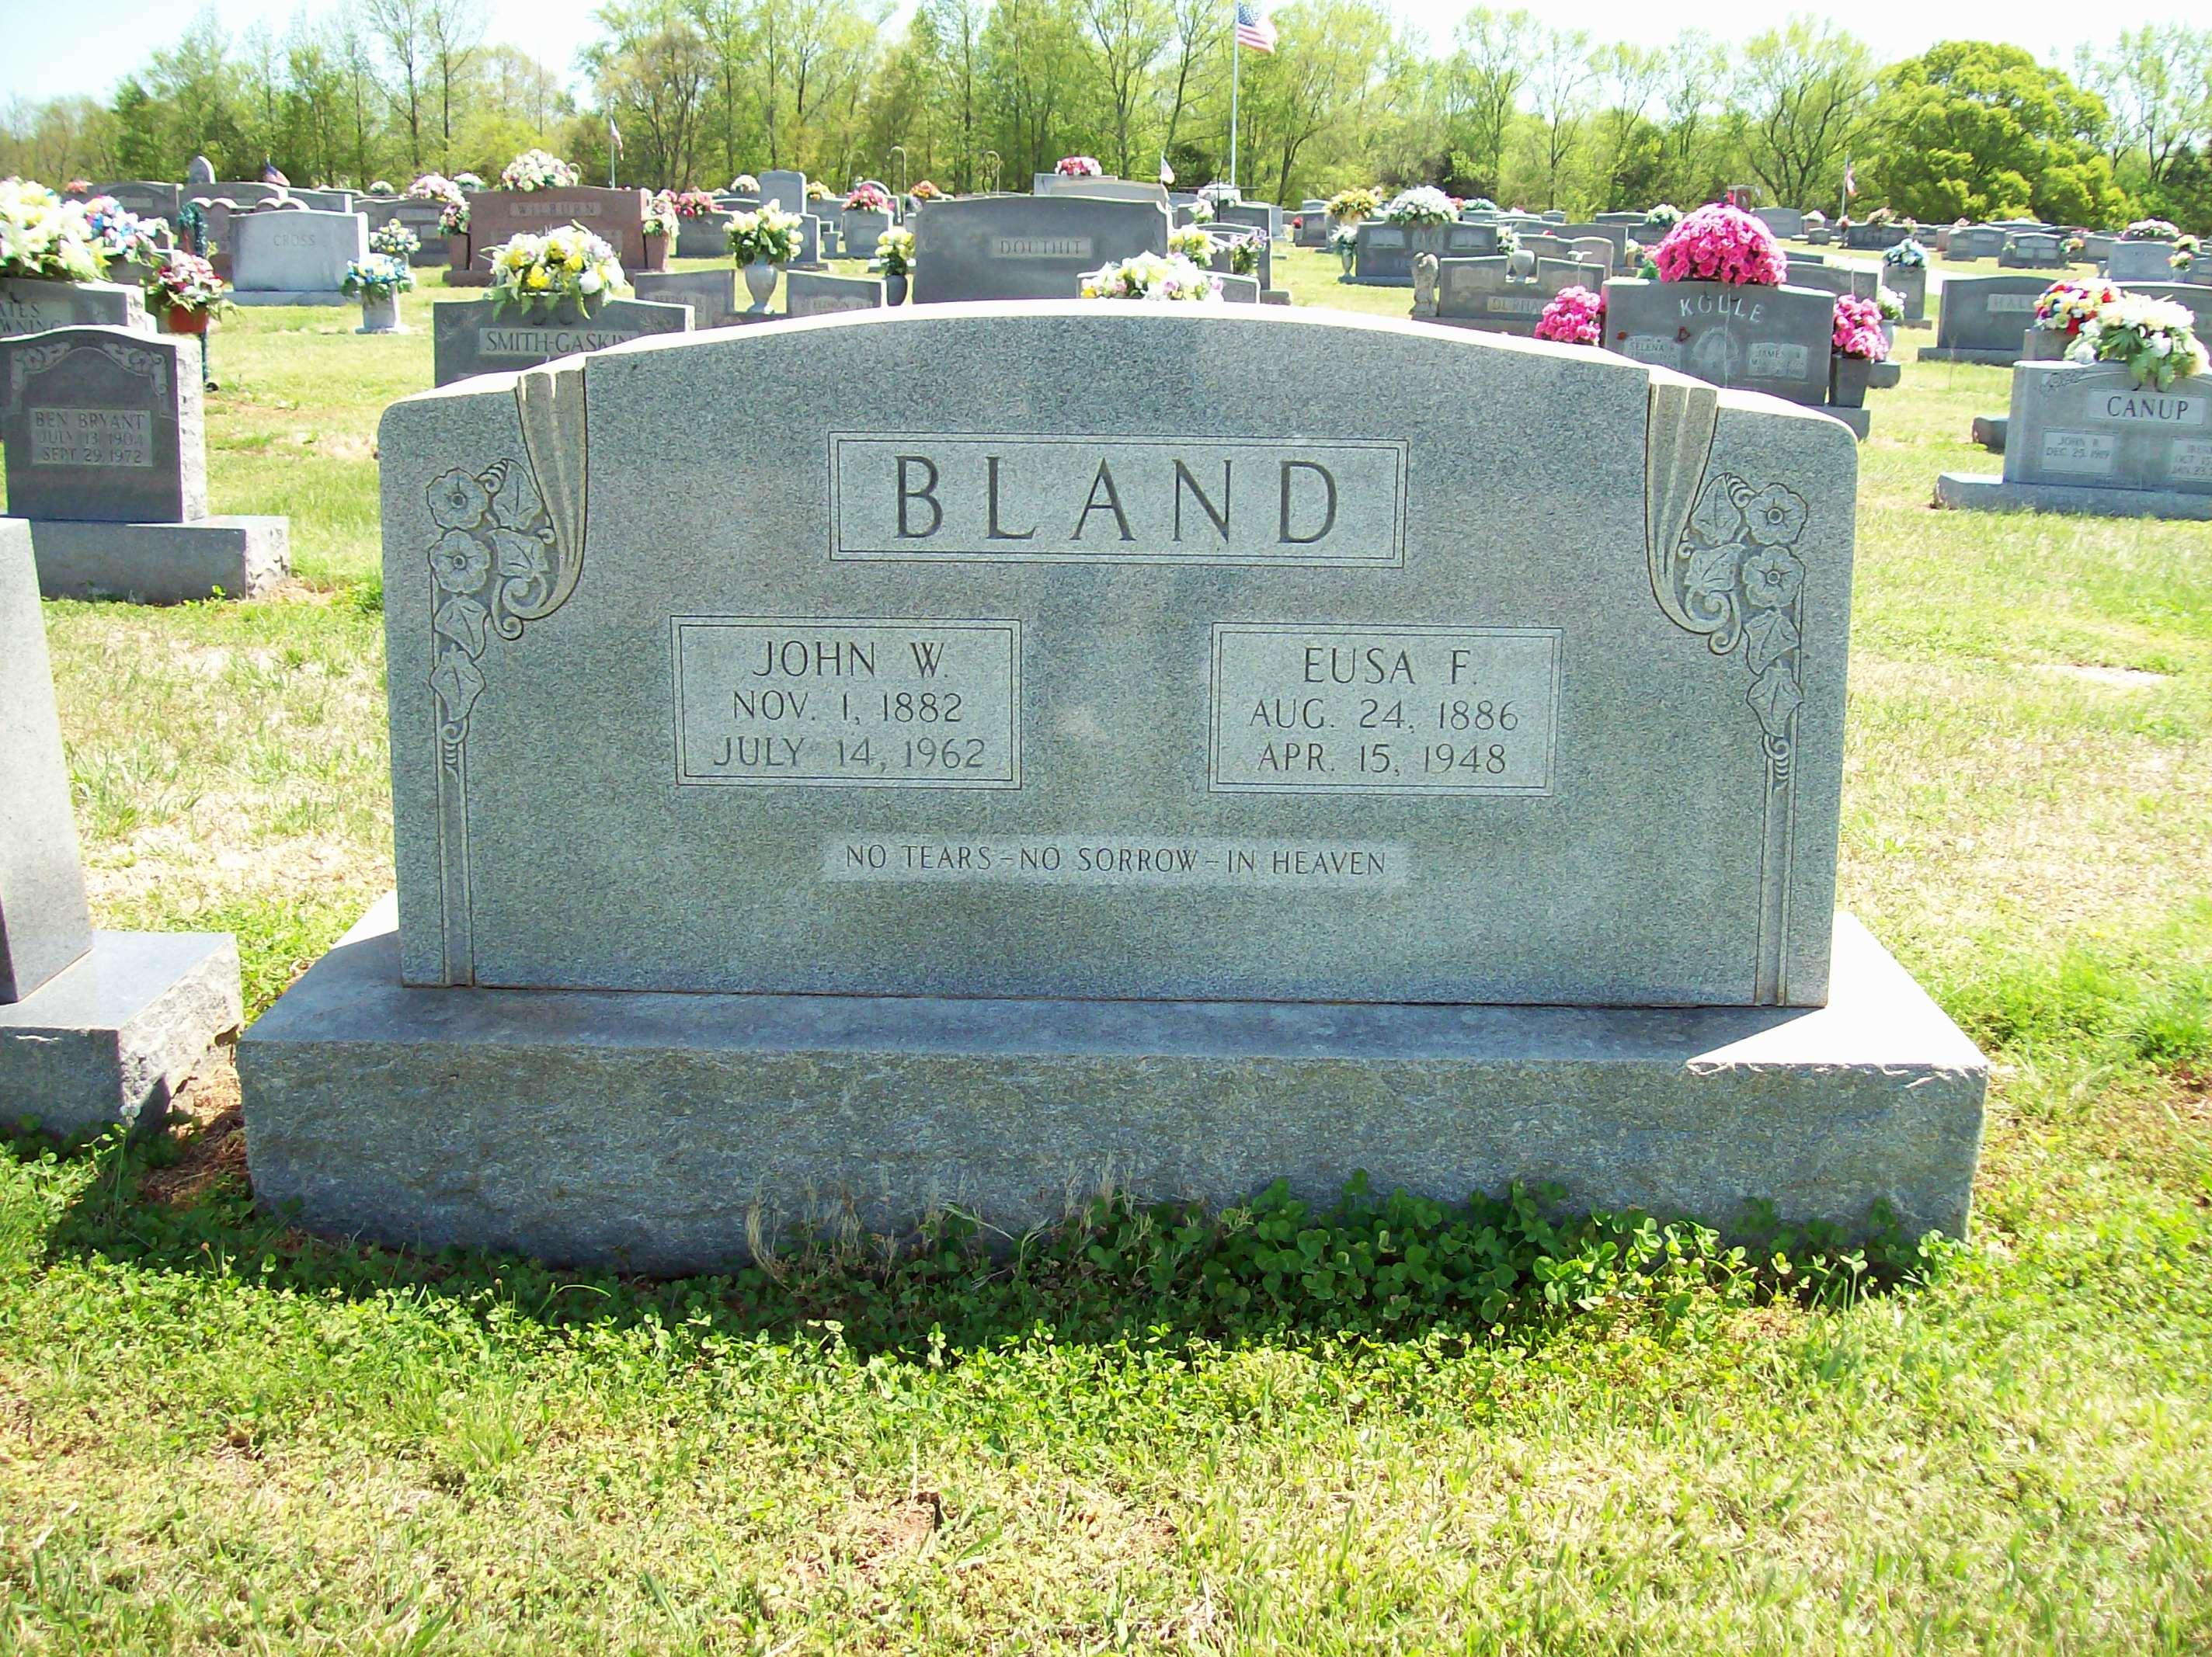 John Thomas Bland